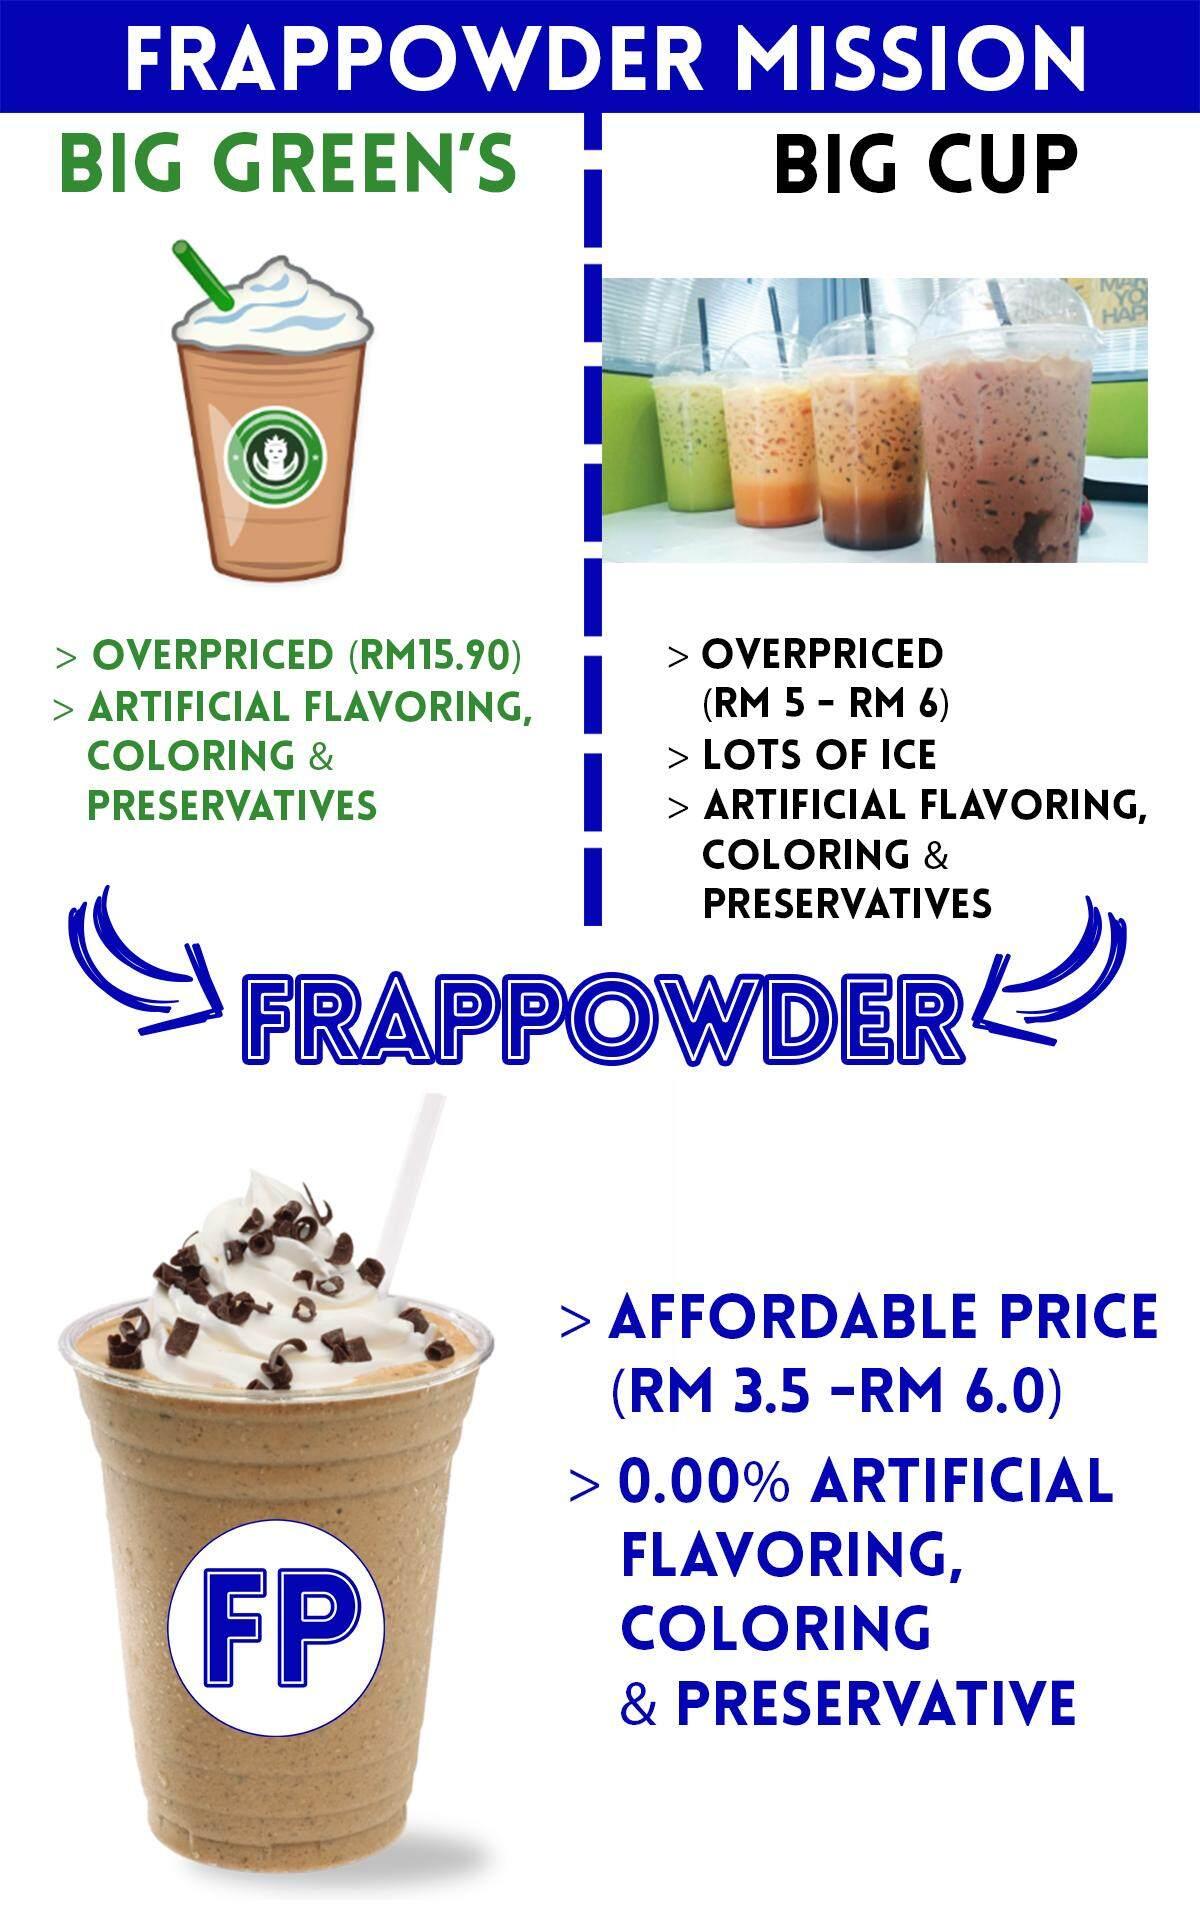 #2 Frappowder Mission 800 x 1500 Lazada Blue Creamy Dark Cocoa.jpg